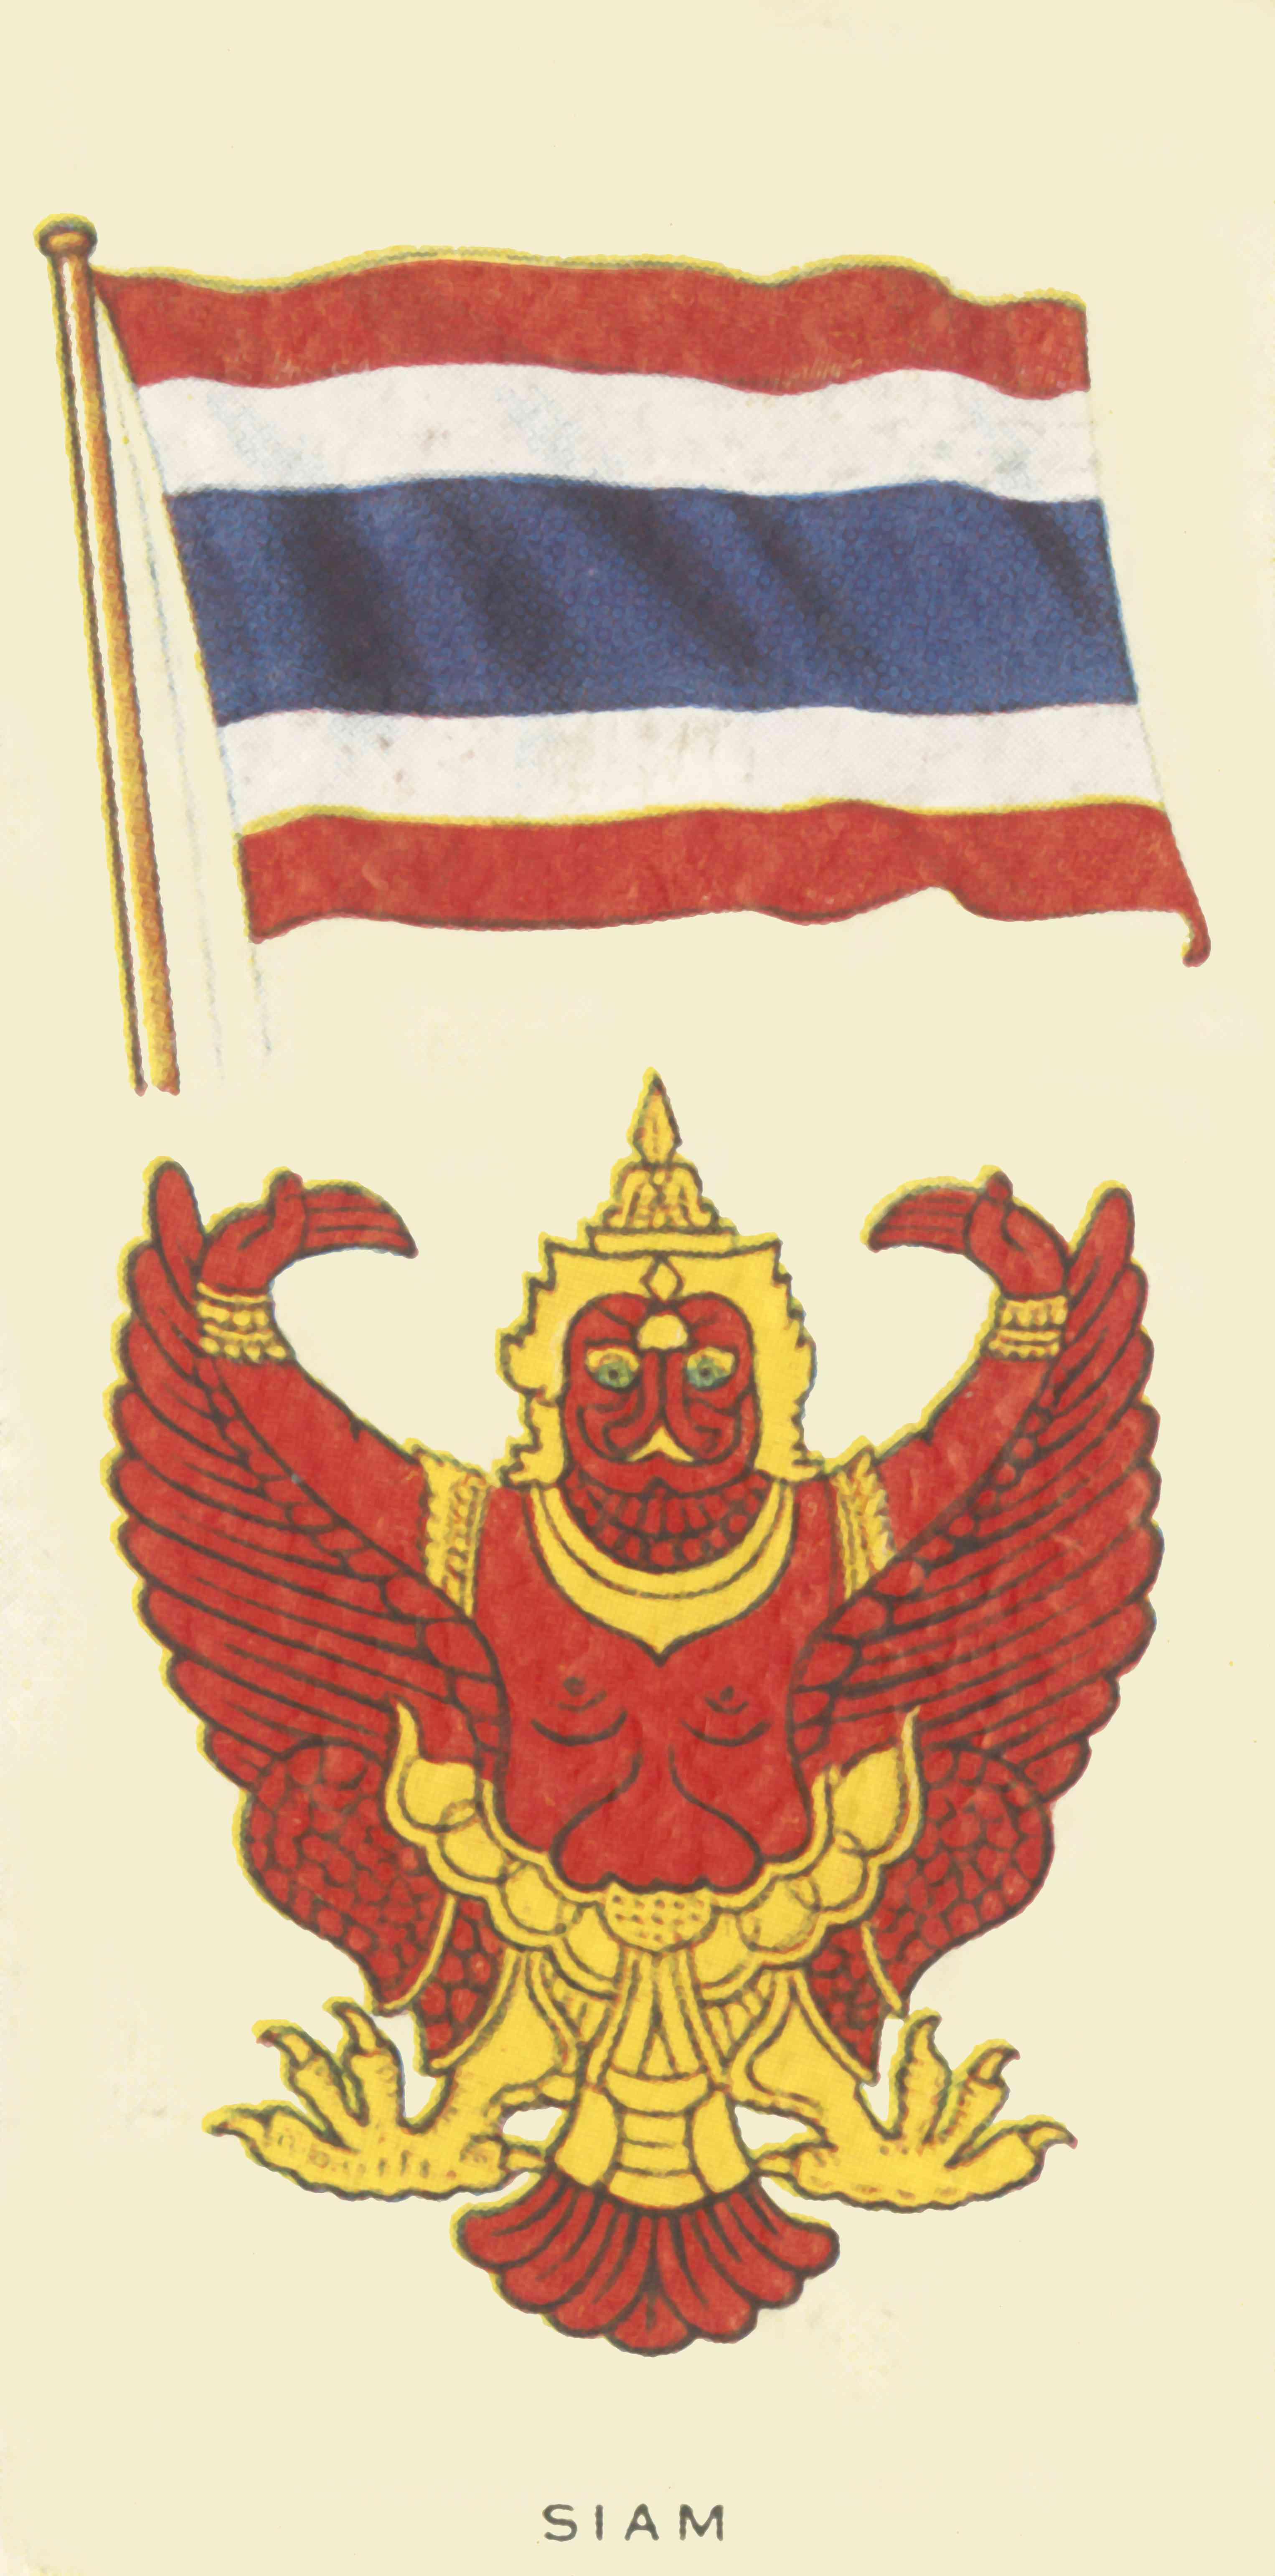 Garuda emblem and the Thai flag